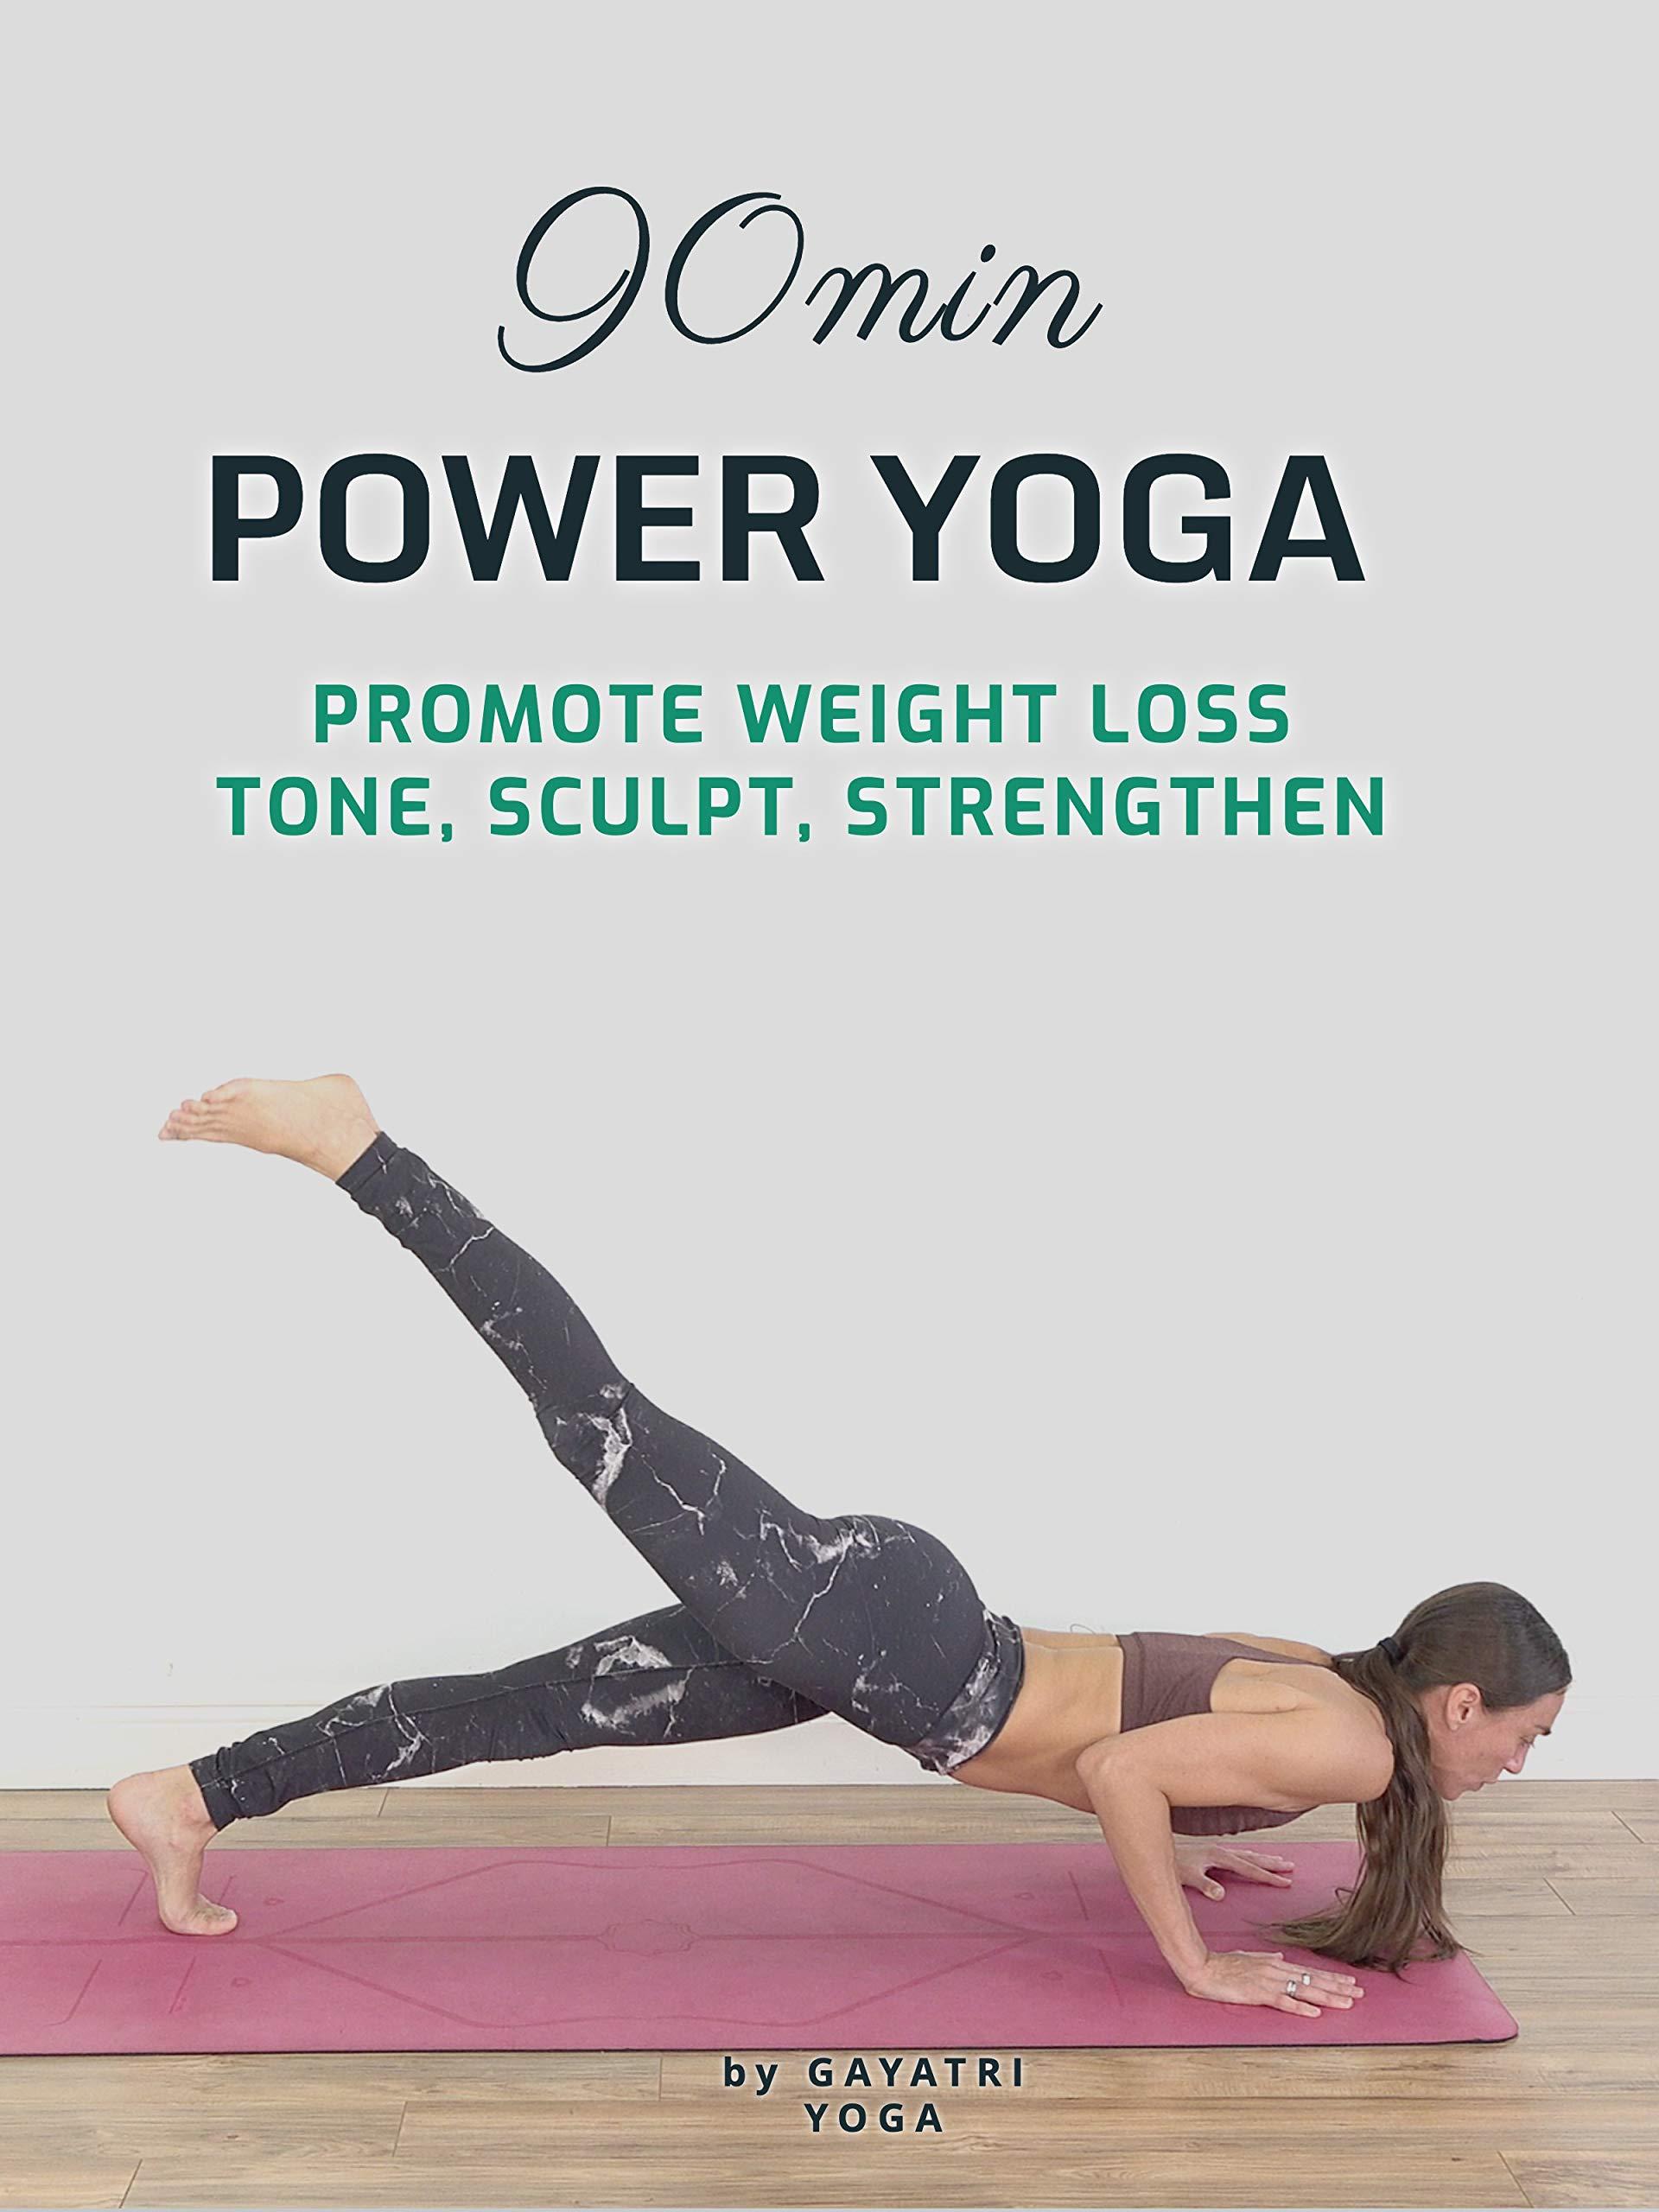 90 Min Power Yoga - Promote Weight Loss, Tone, Sculpt, Strengthen - Gayatri Yoga